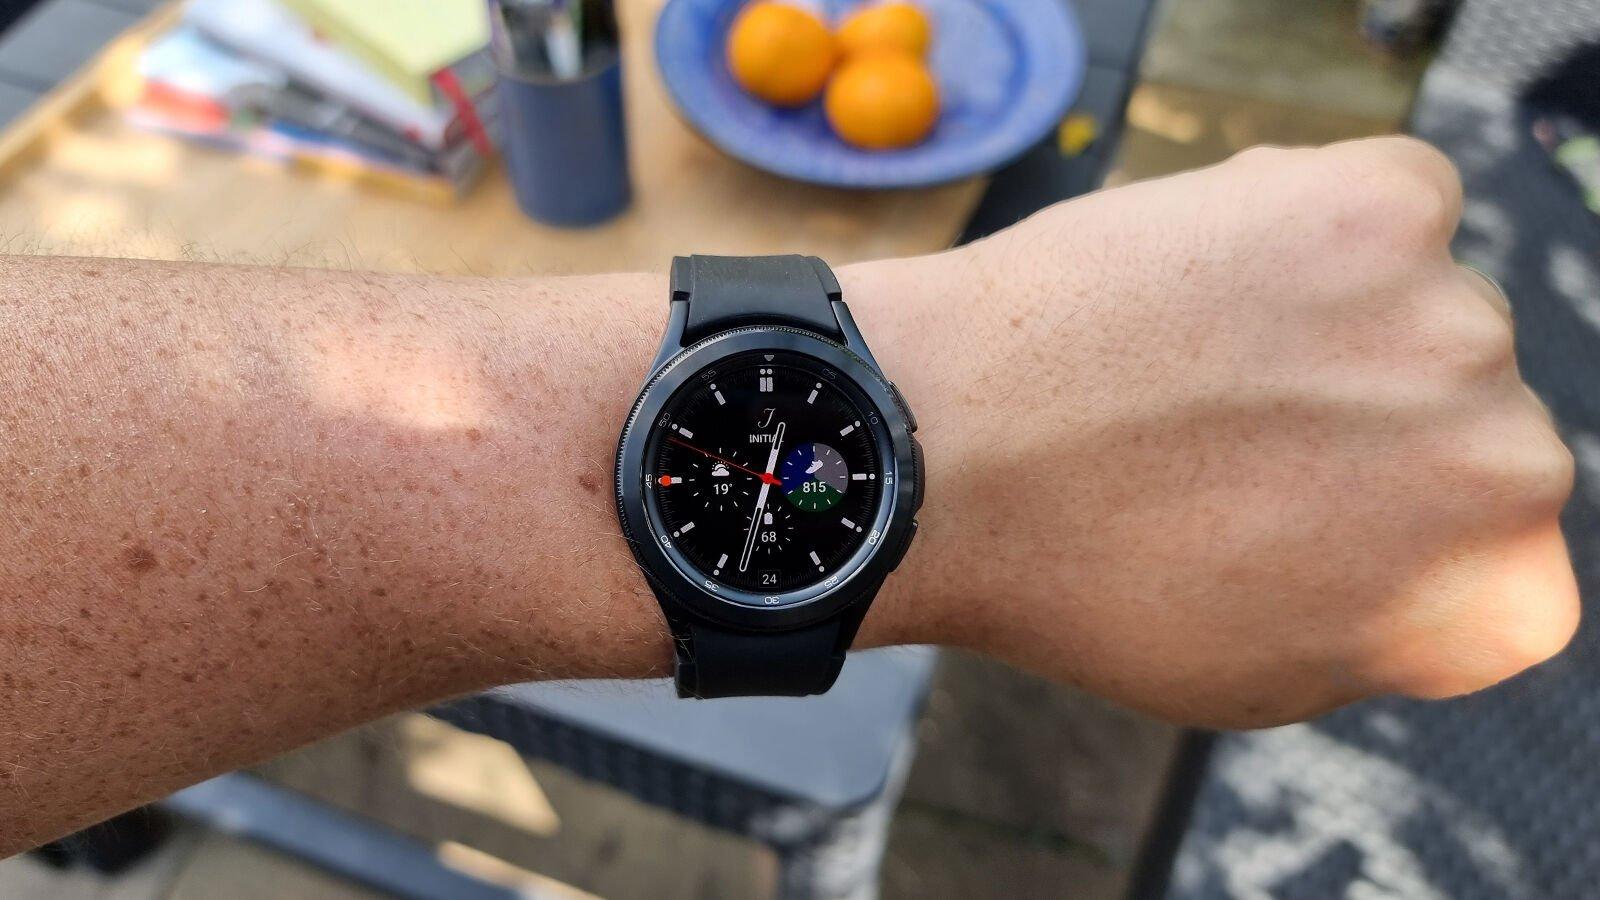 Samsung Galaxy Watch 4 Classic on wrist